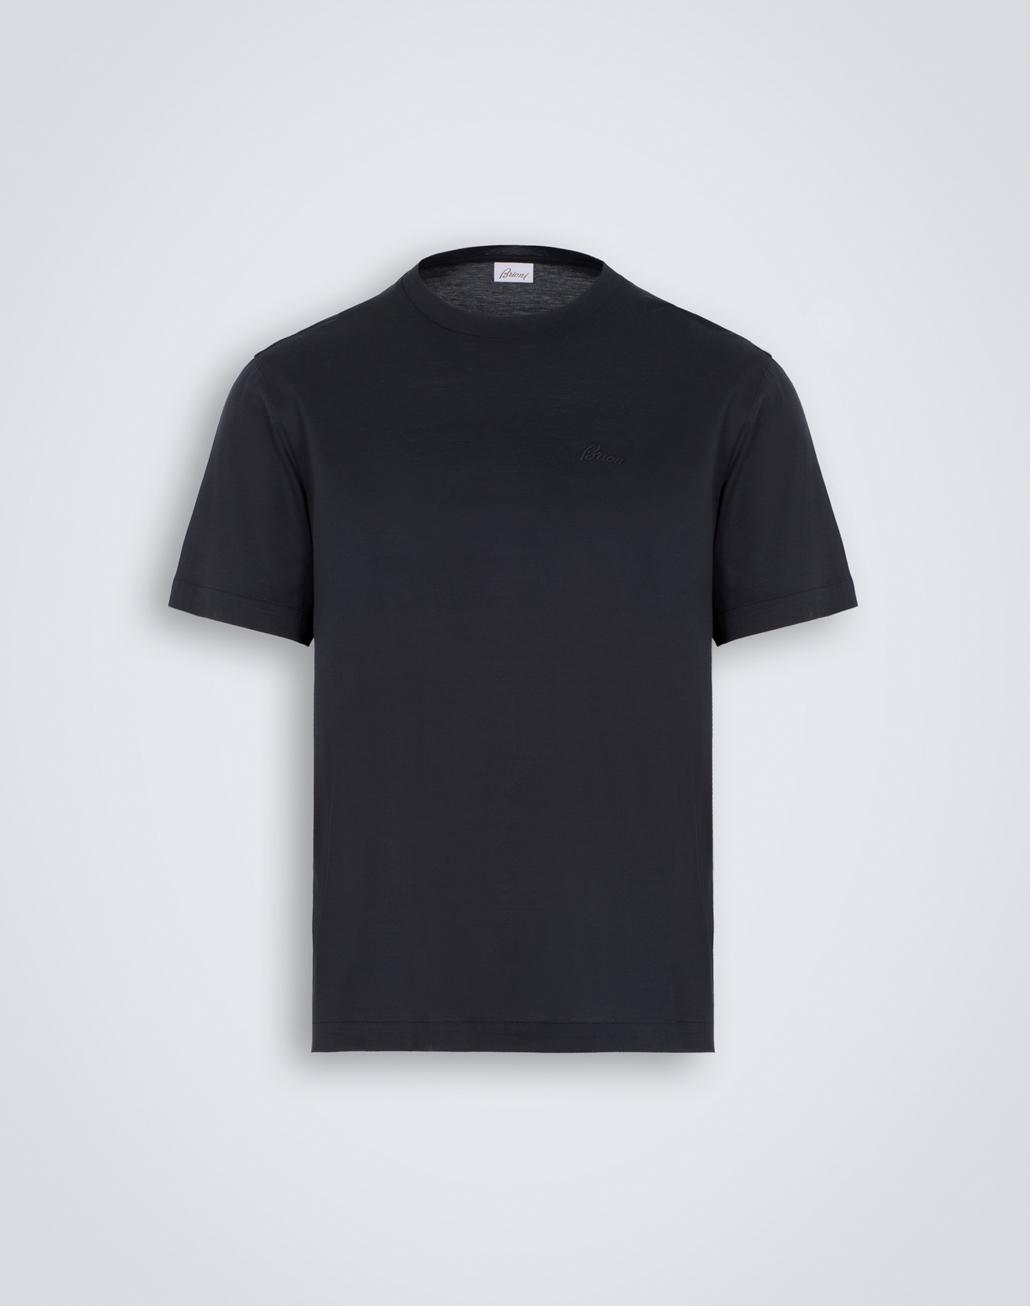 BRIONI Grey Crewneck T-Shirt. T-Shirts & Polos Man f